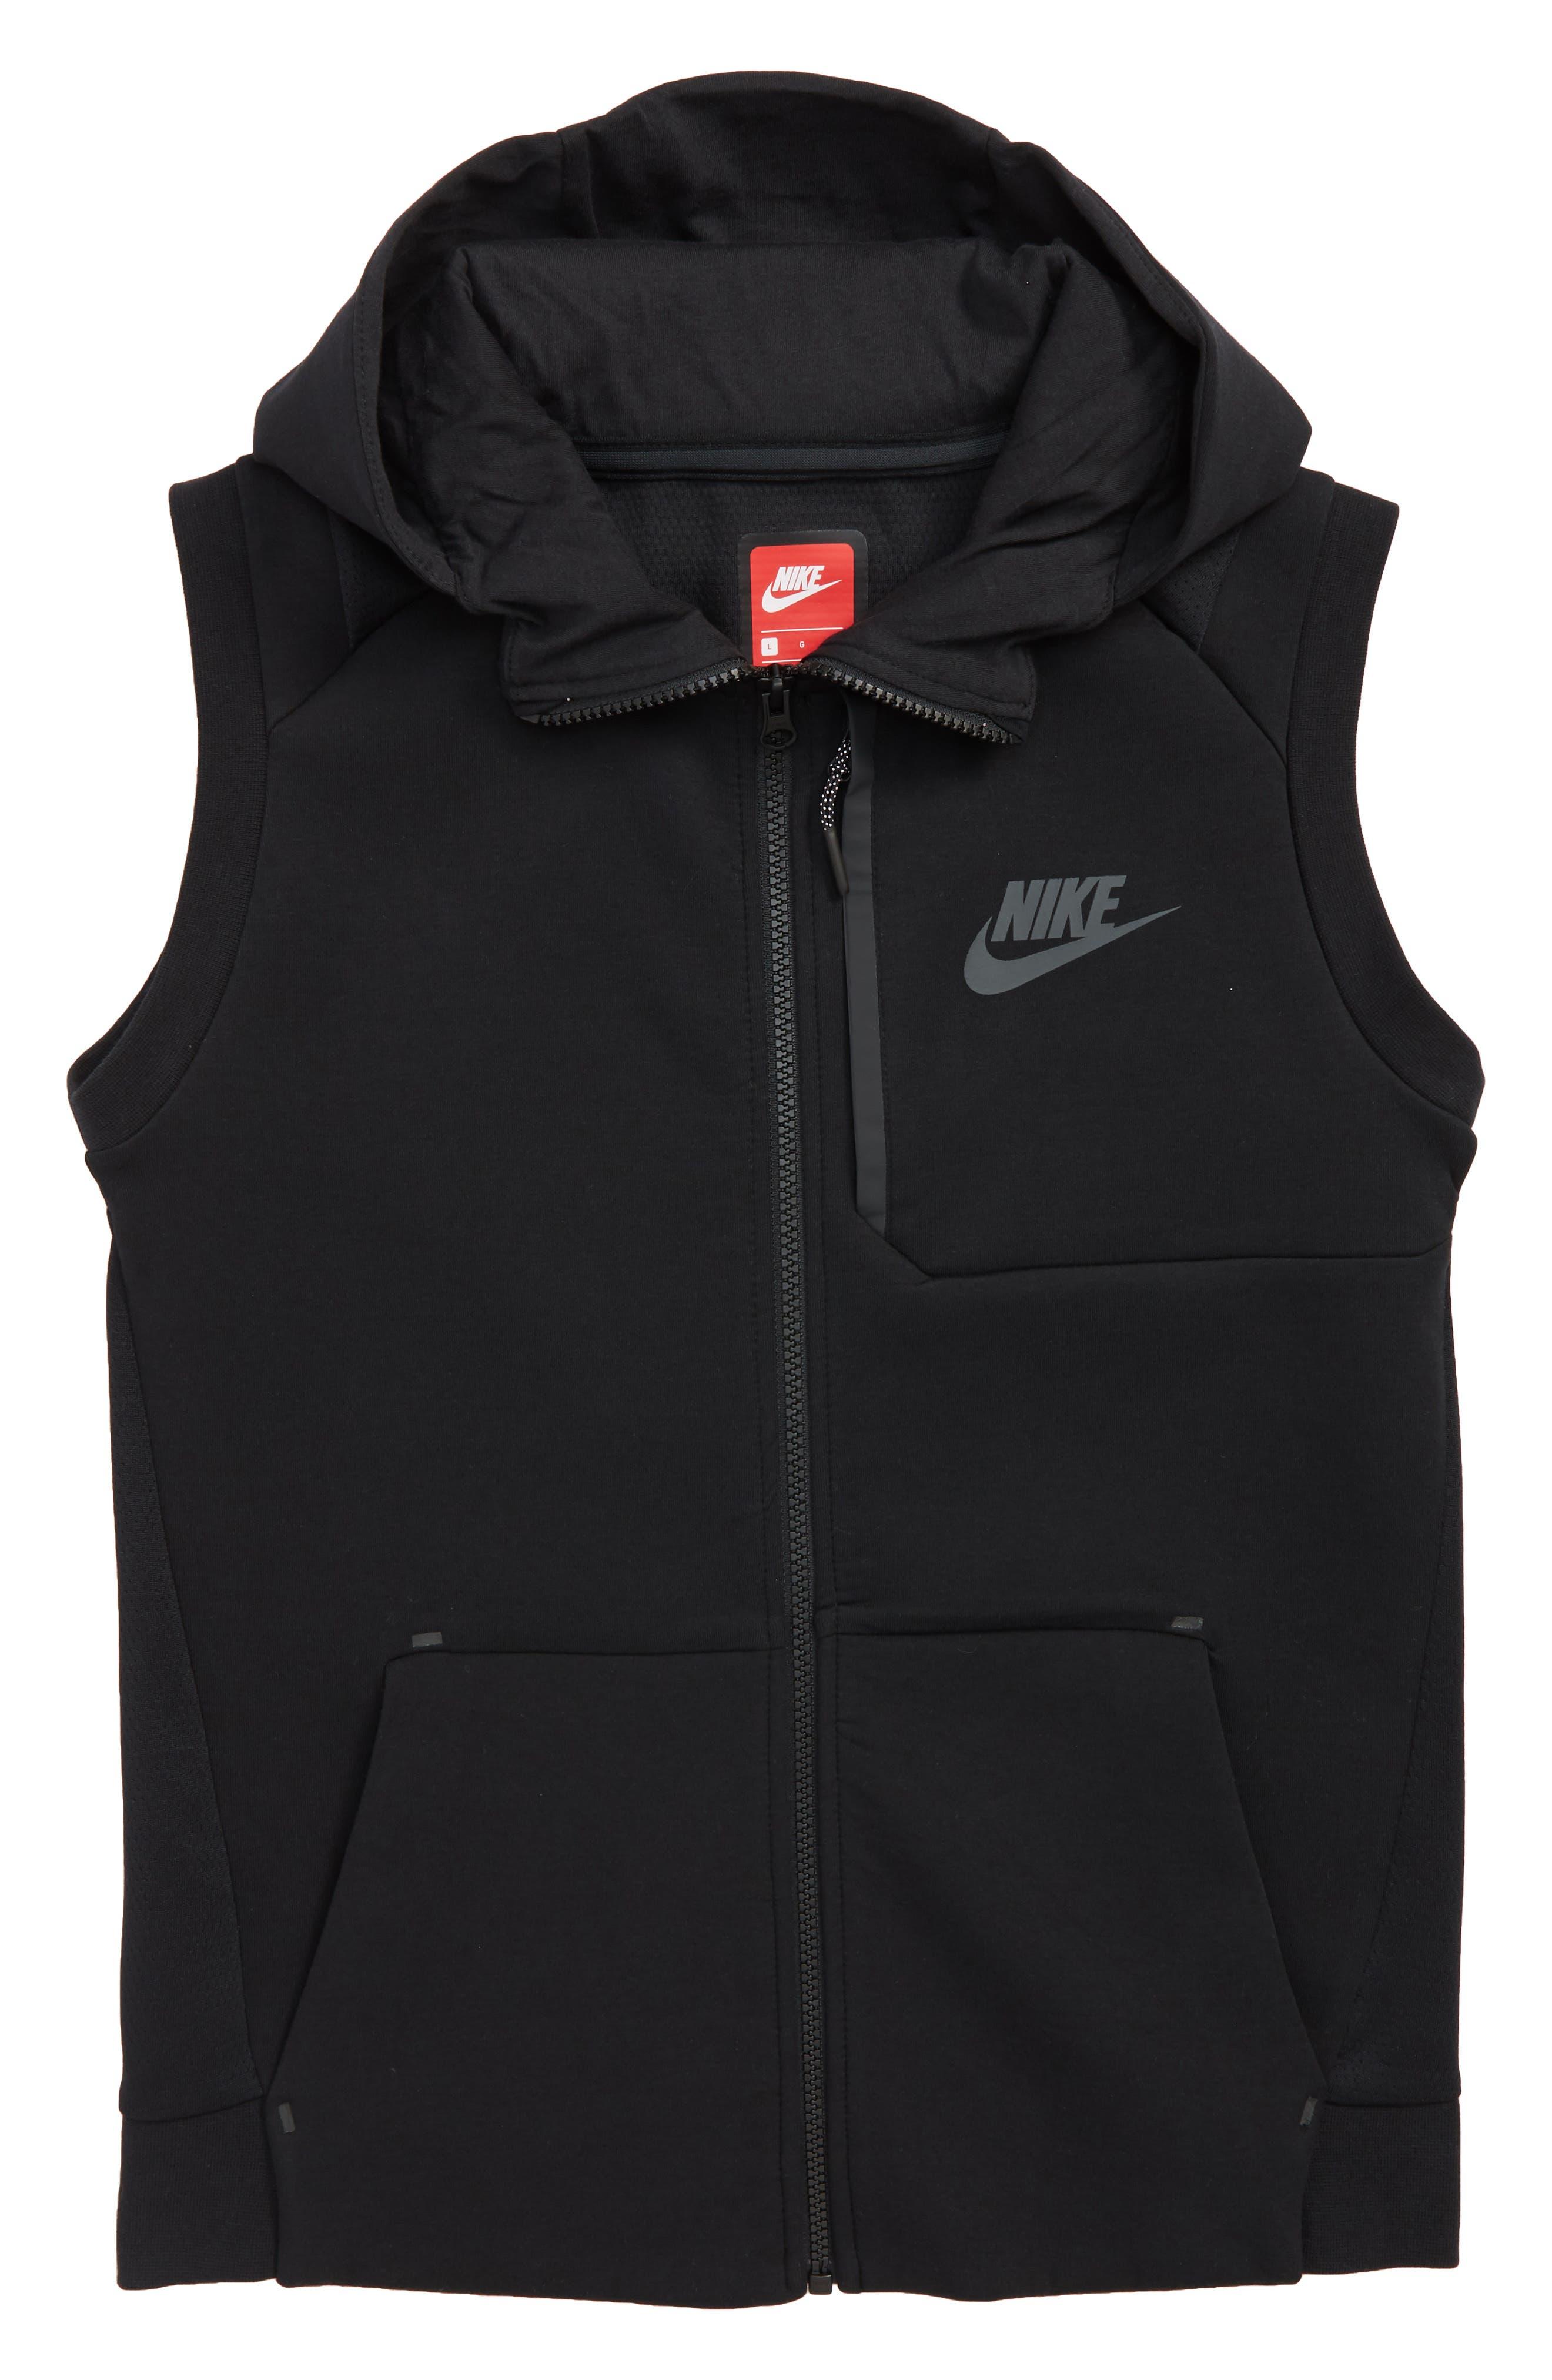 Sportswear Tech Fleece Hooded Vest,                         Main,                         color, Black/ Anthracite